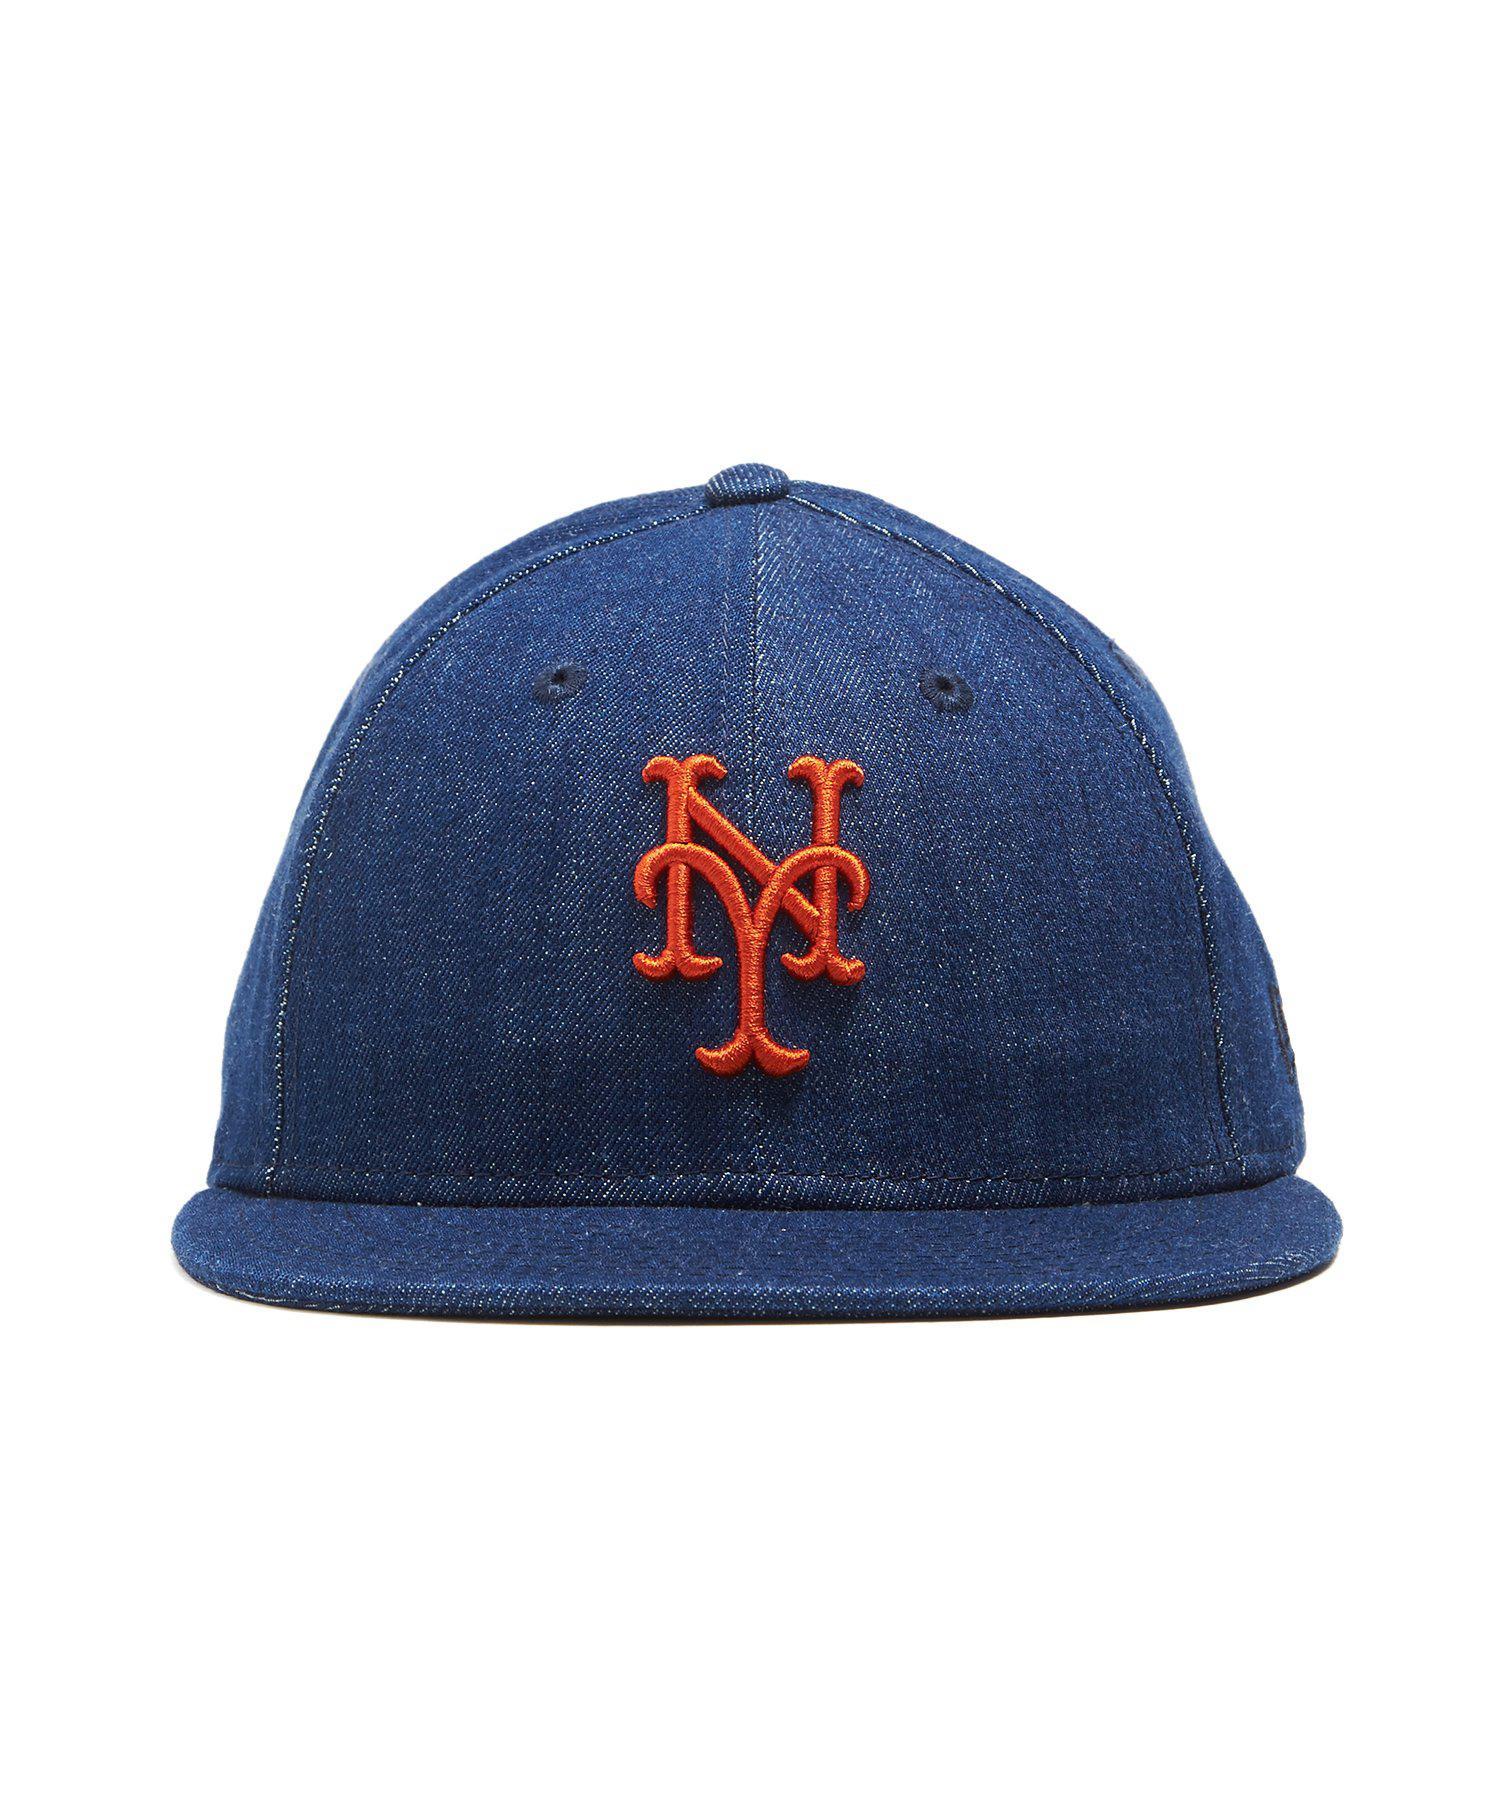 93a4114df13 Lyst - NEW ERA HATS Mlb New York Mets Cap In Cone Denim in Blue for Men